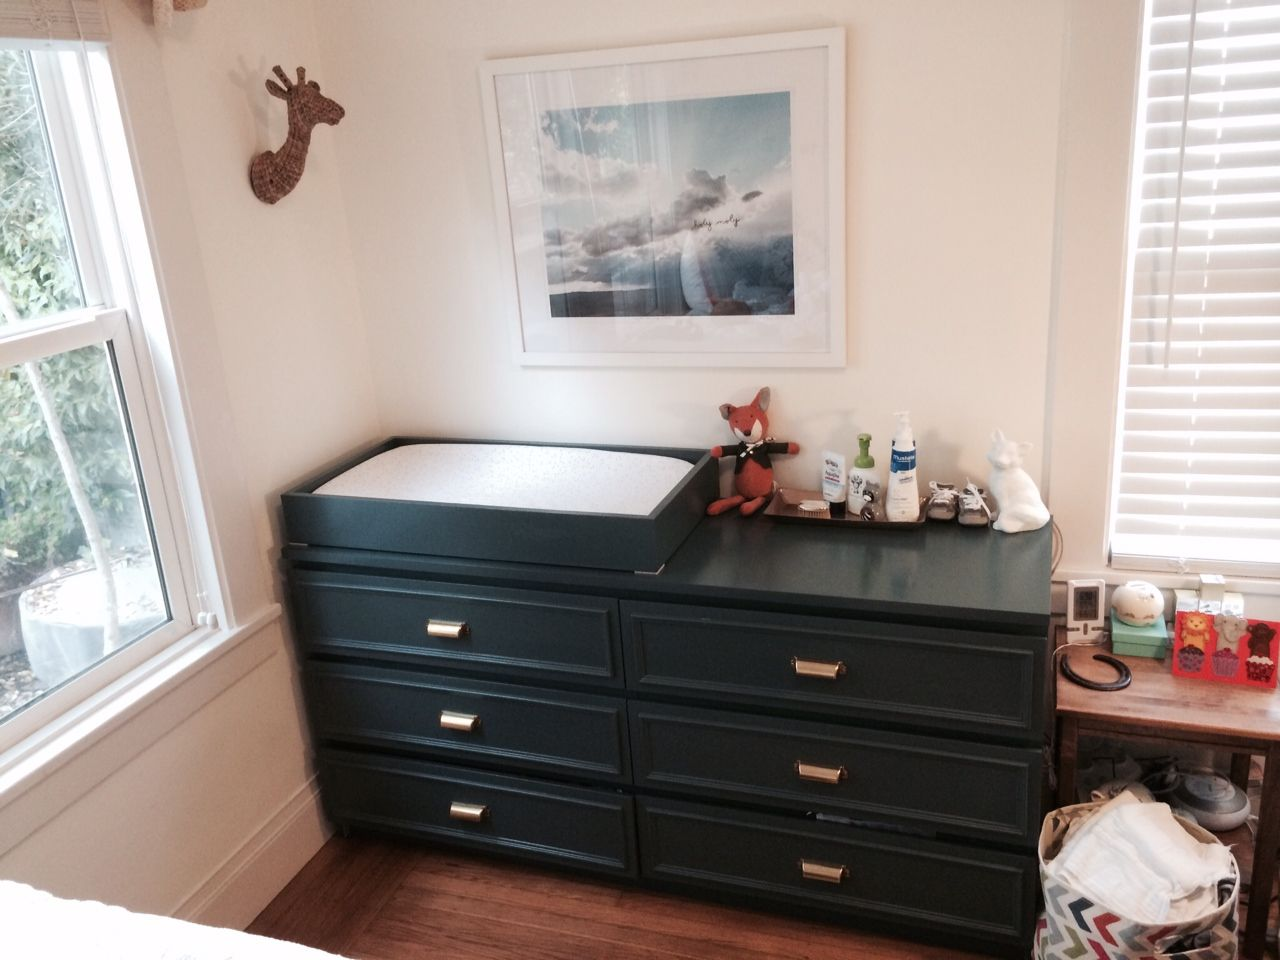 Ikea Malm Dresser Hack Changing Table Diy W Brass Pulls Ikea